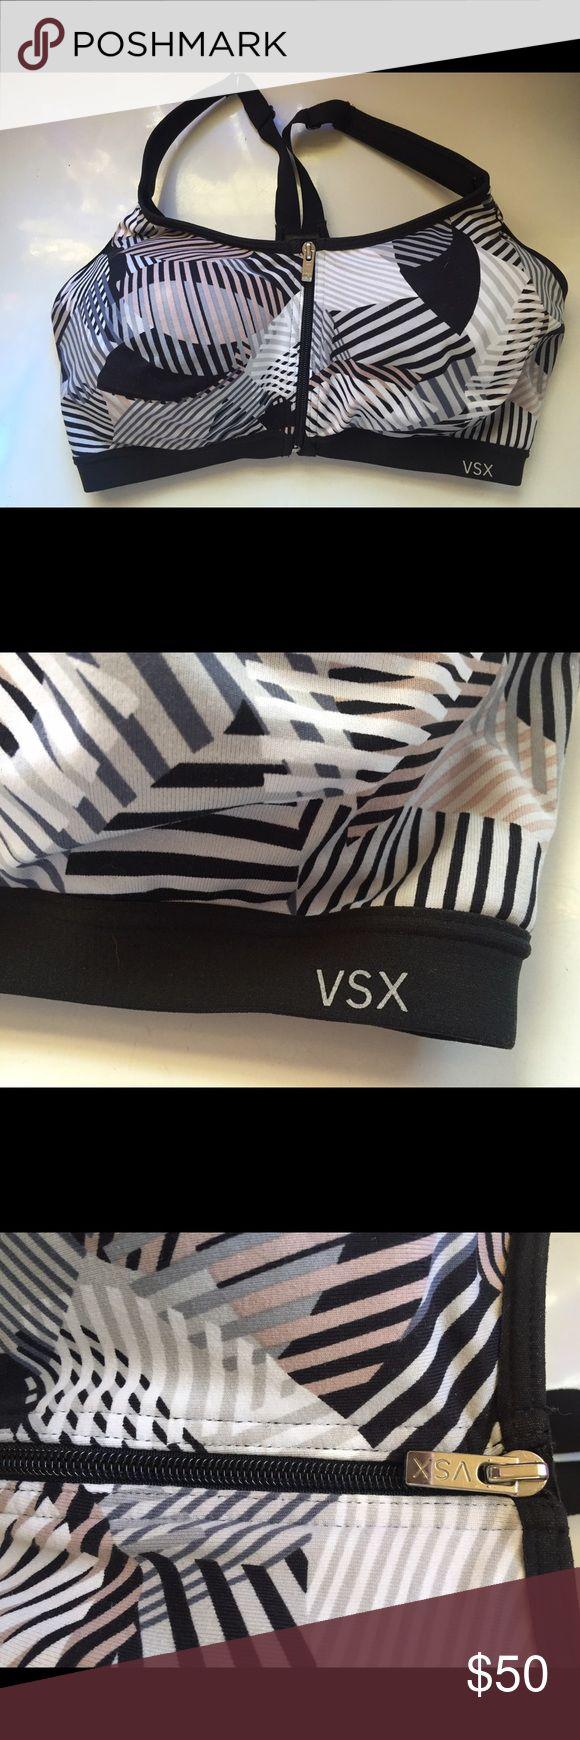 Vsx knockout sport bra like new  36 DD zip close Vsx knockout bra like new! Really beautiful piece just doesn't fit me. :( Victoria's Secret Intimates & Sleepwear Bras